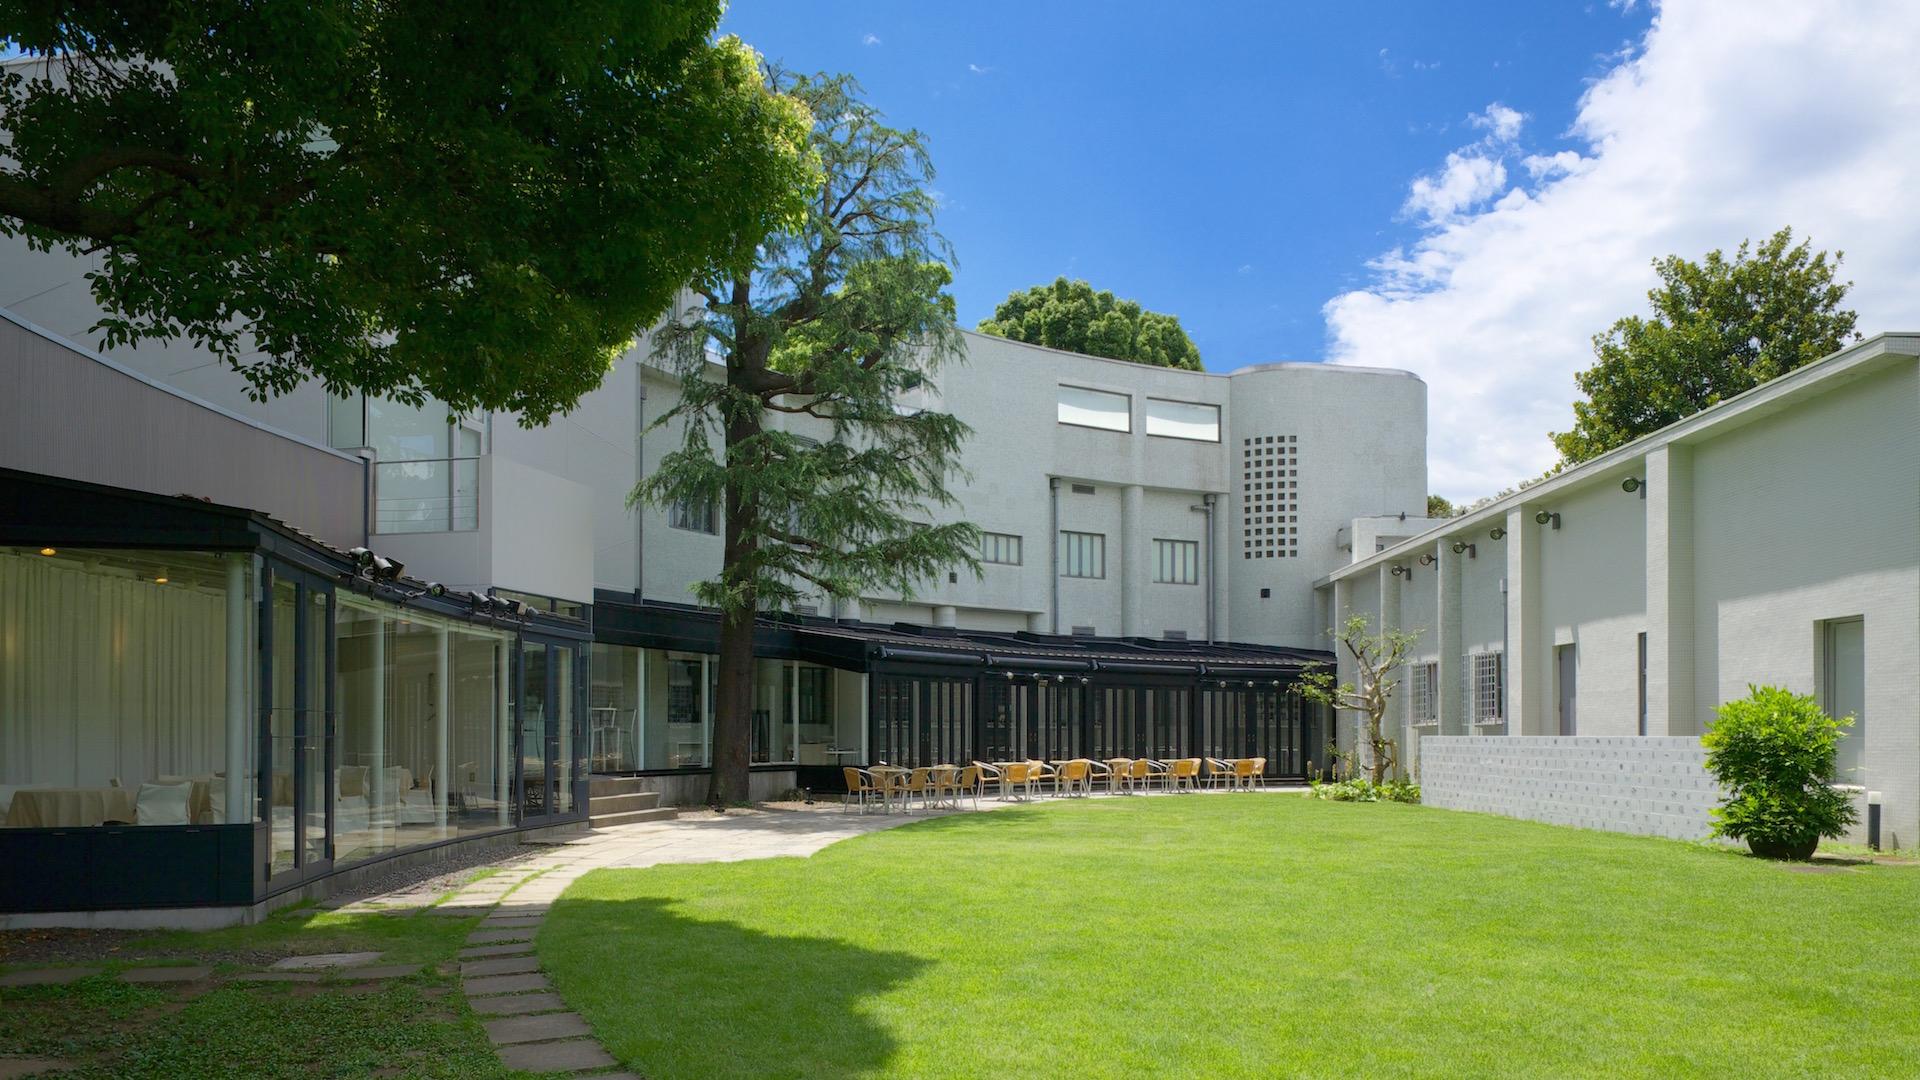 Hara Museum of Contemporary Art, Tokyo